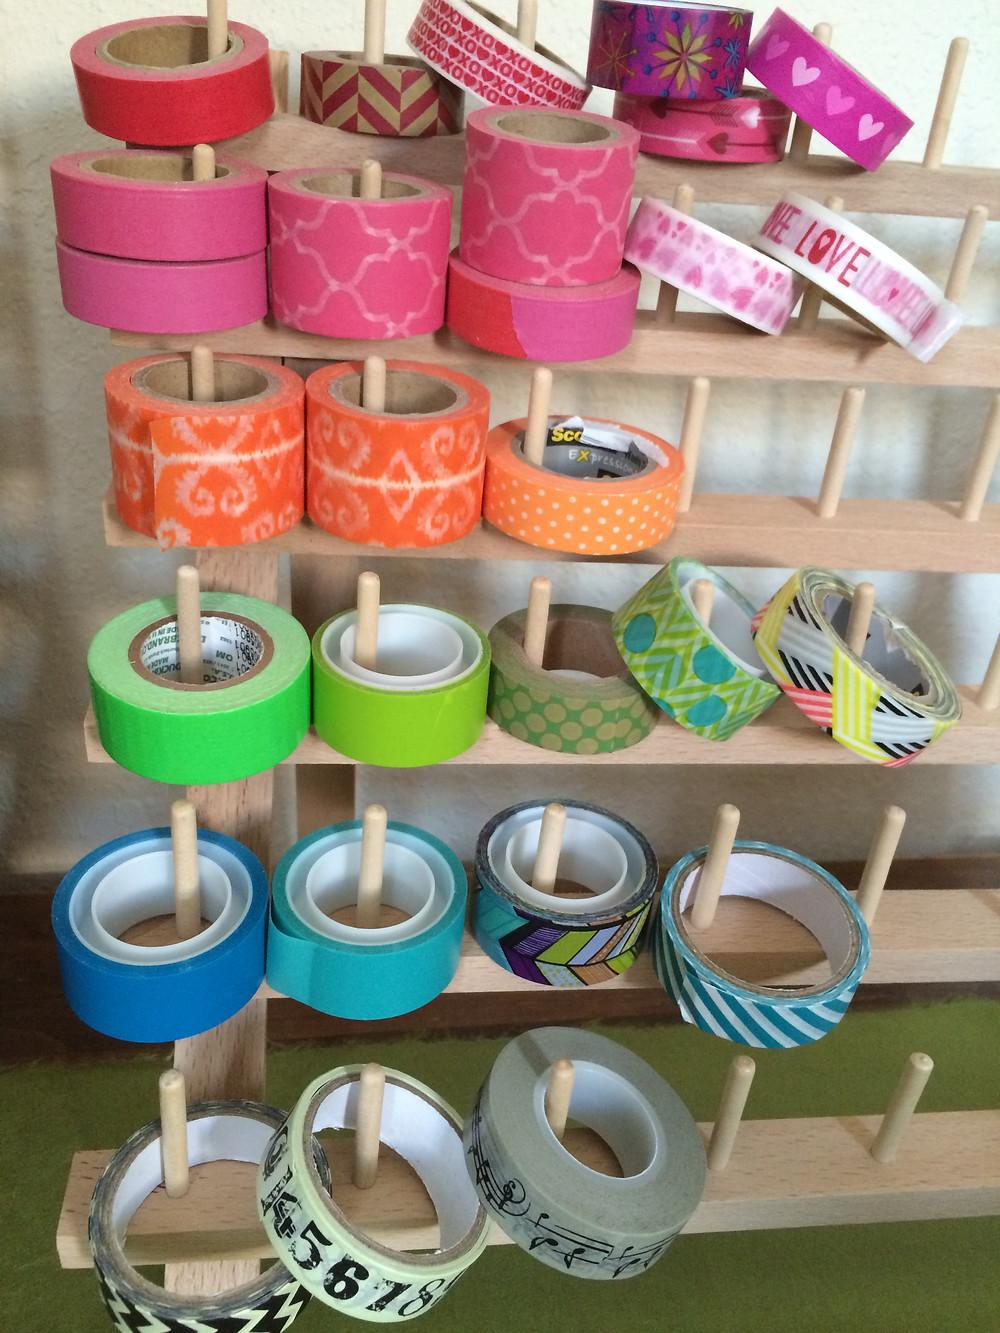 Washi tape storage on a spool holder